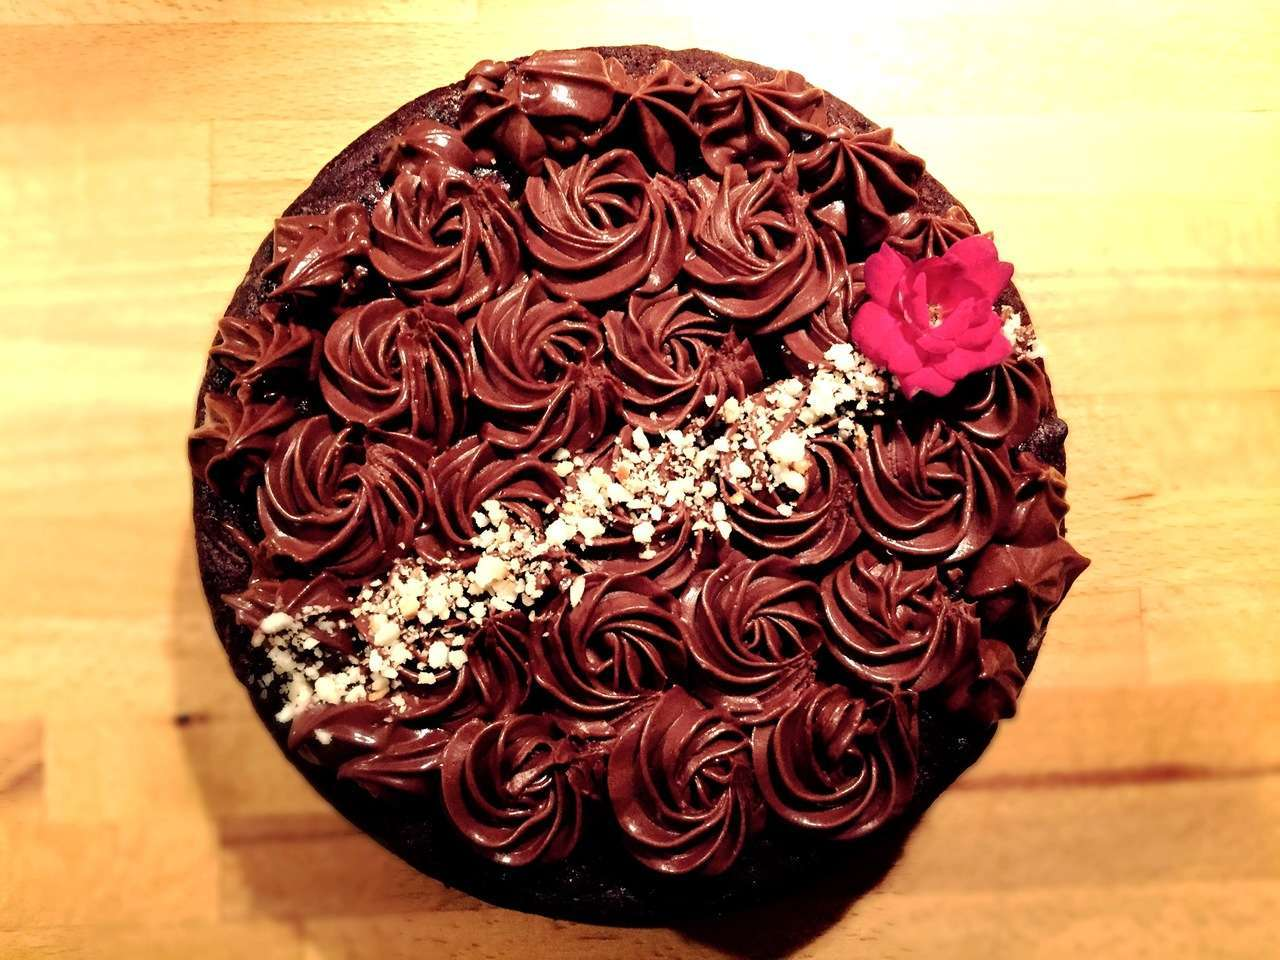 Double chocolate&zucchini cake